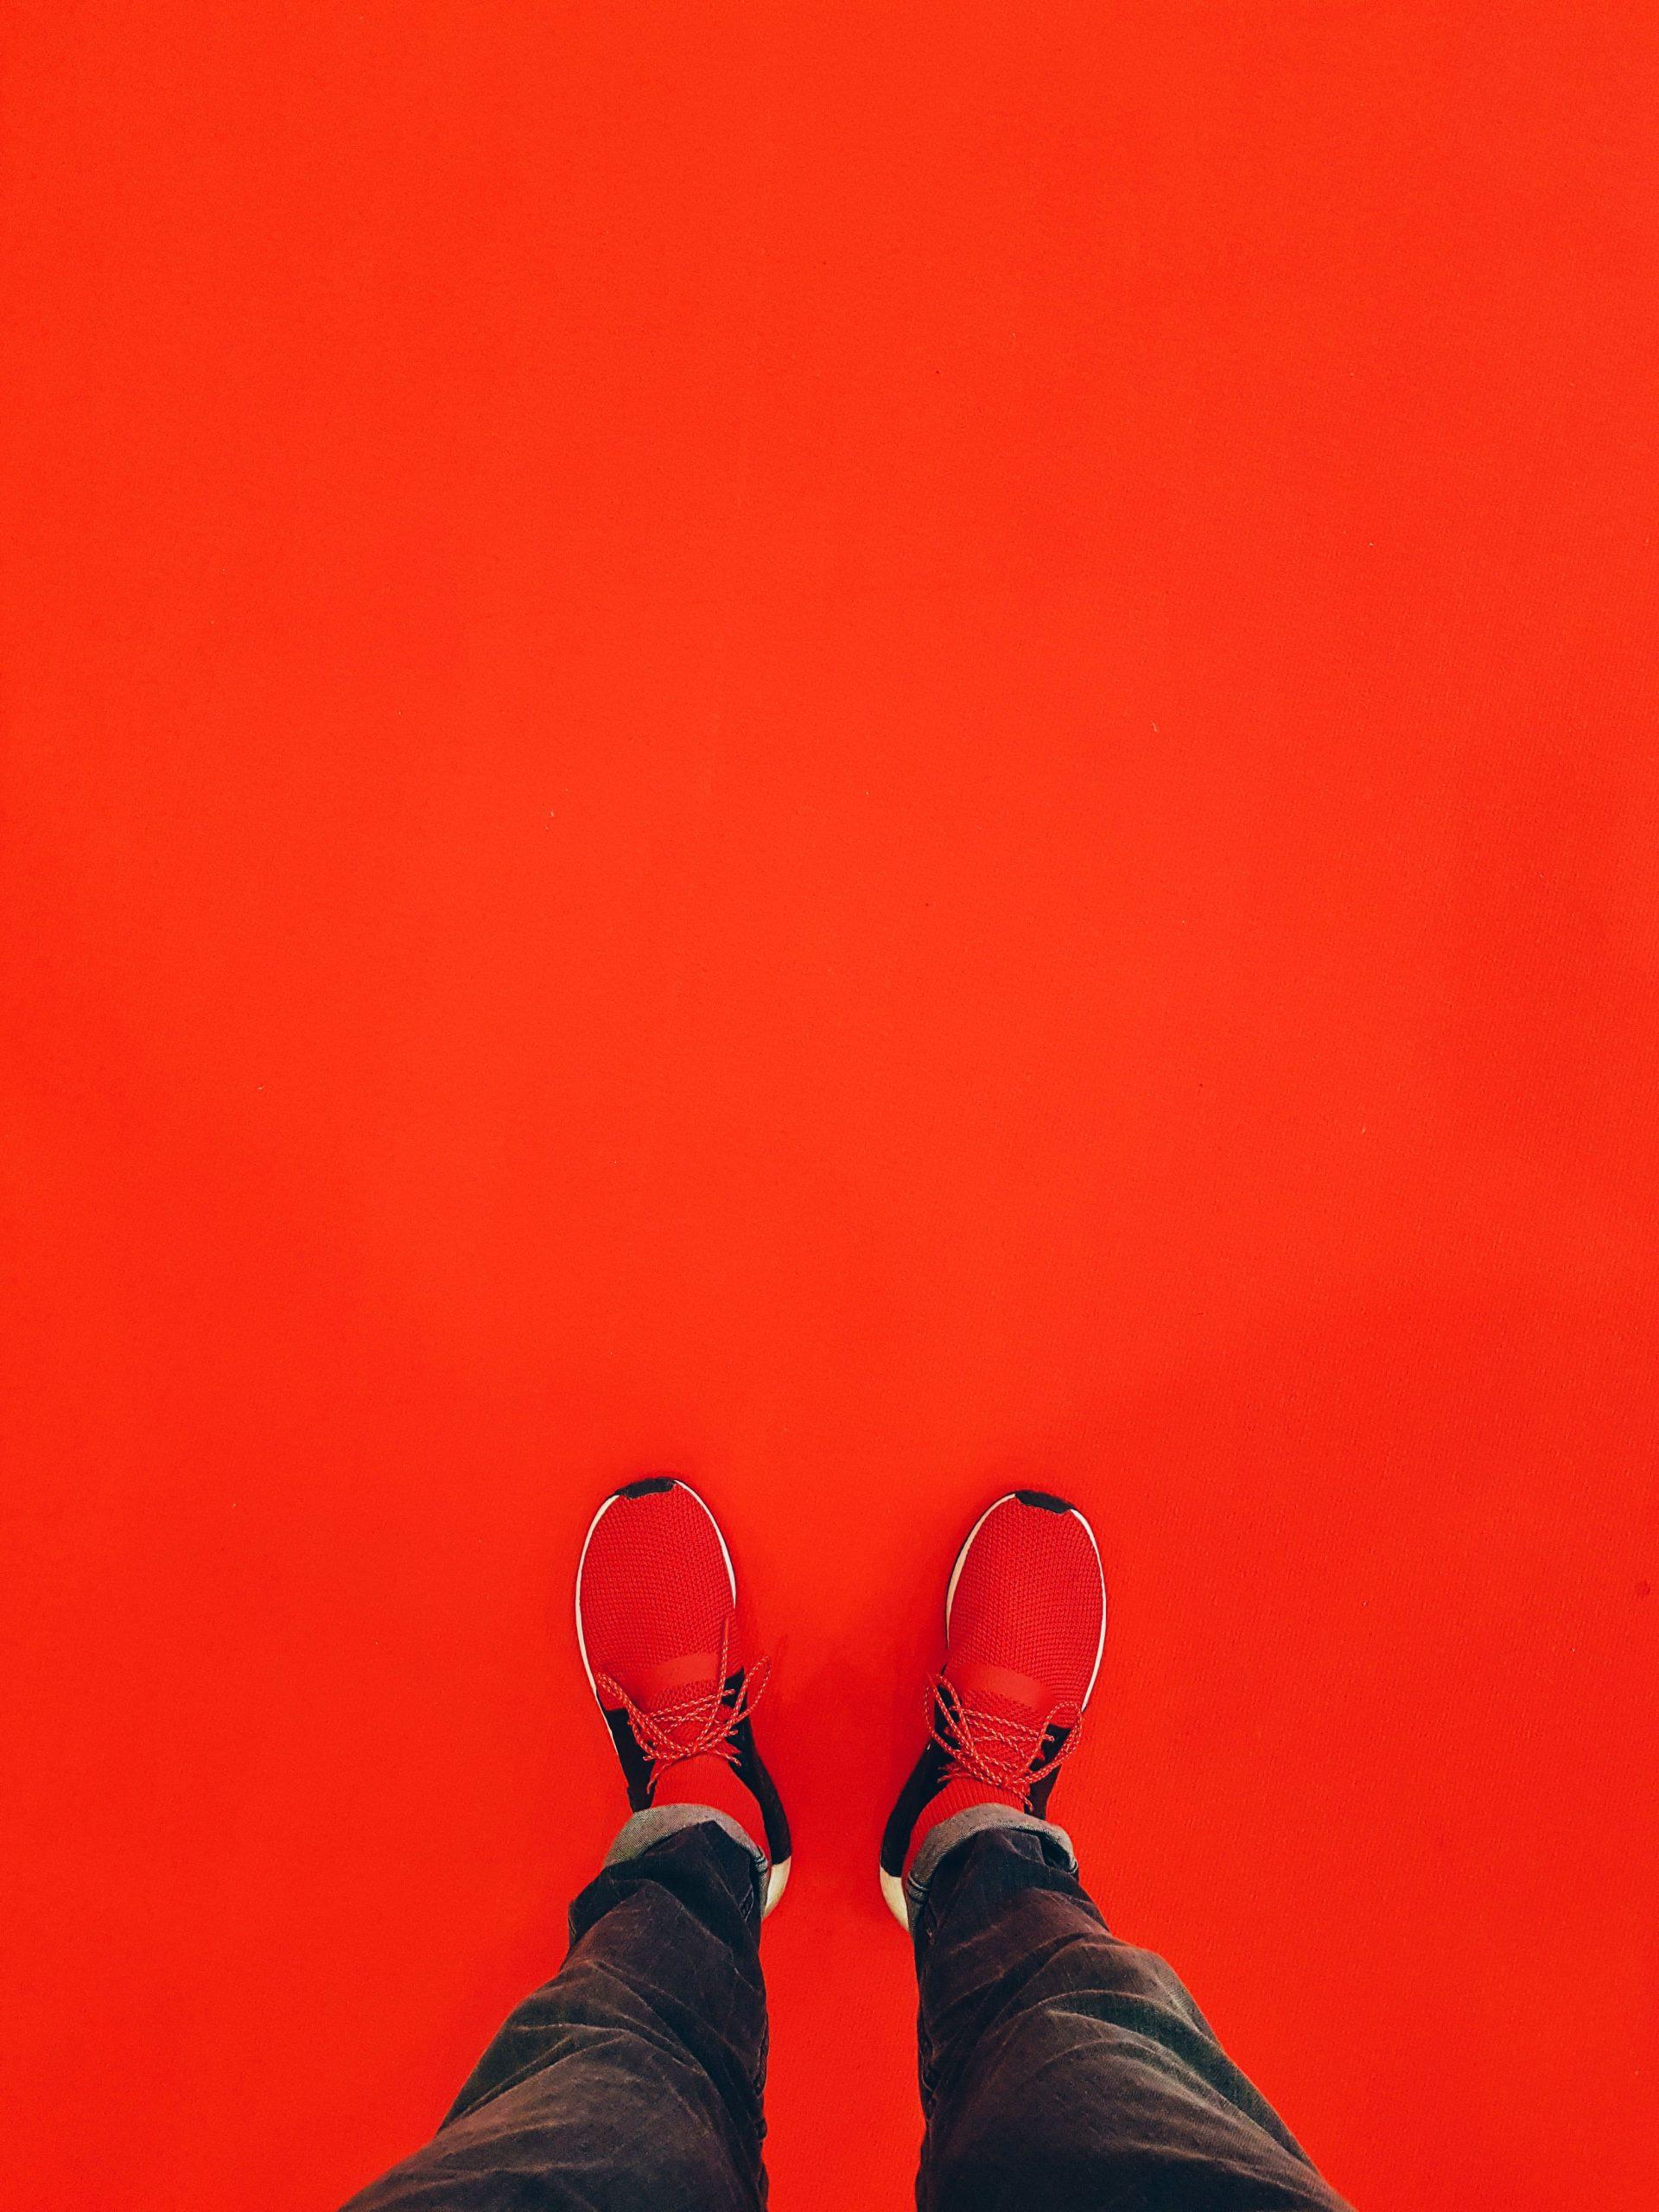 hd New Red Wallpaper